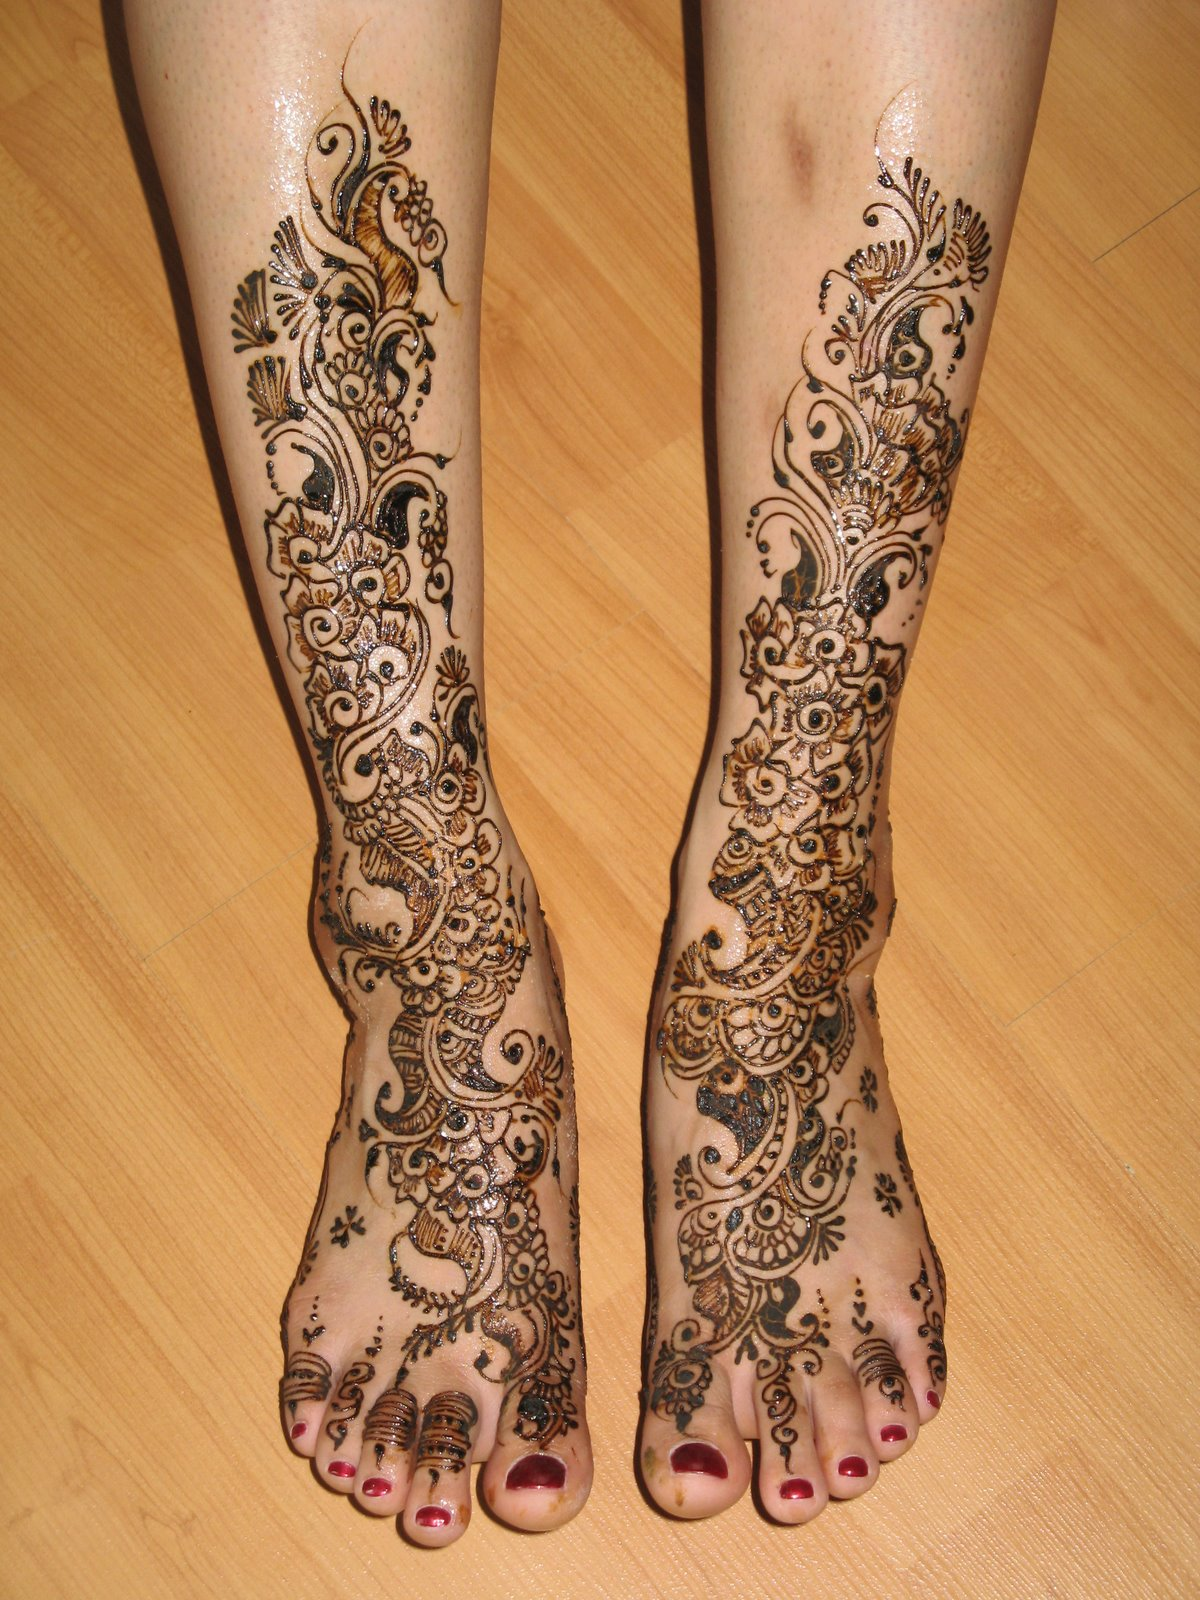 Pakistani Mehandi Designs 2012: Foot Mehndi Designs